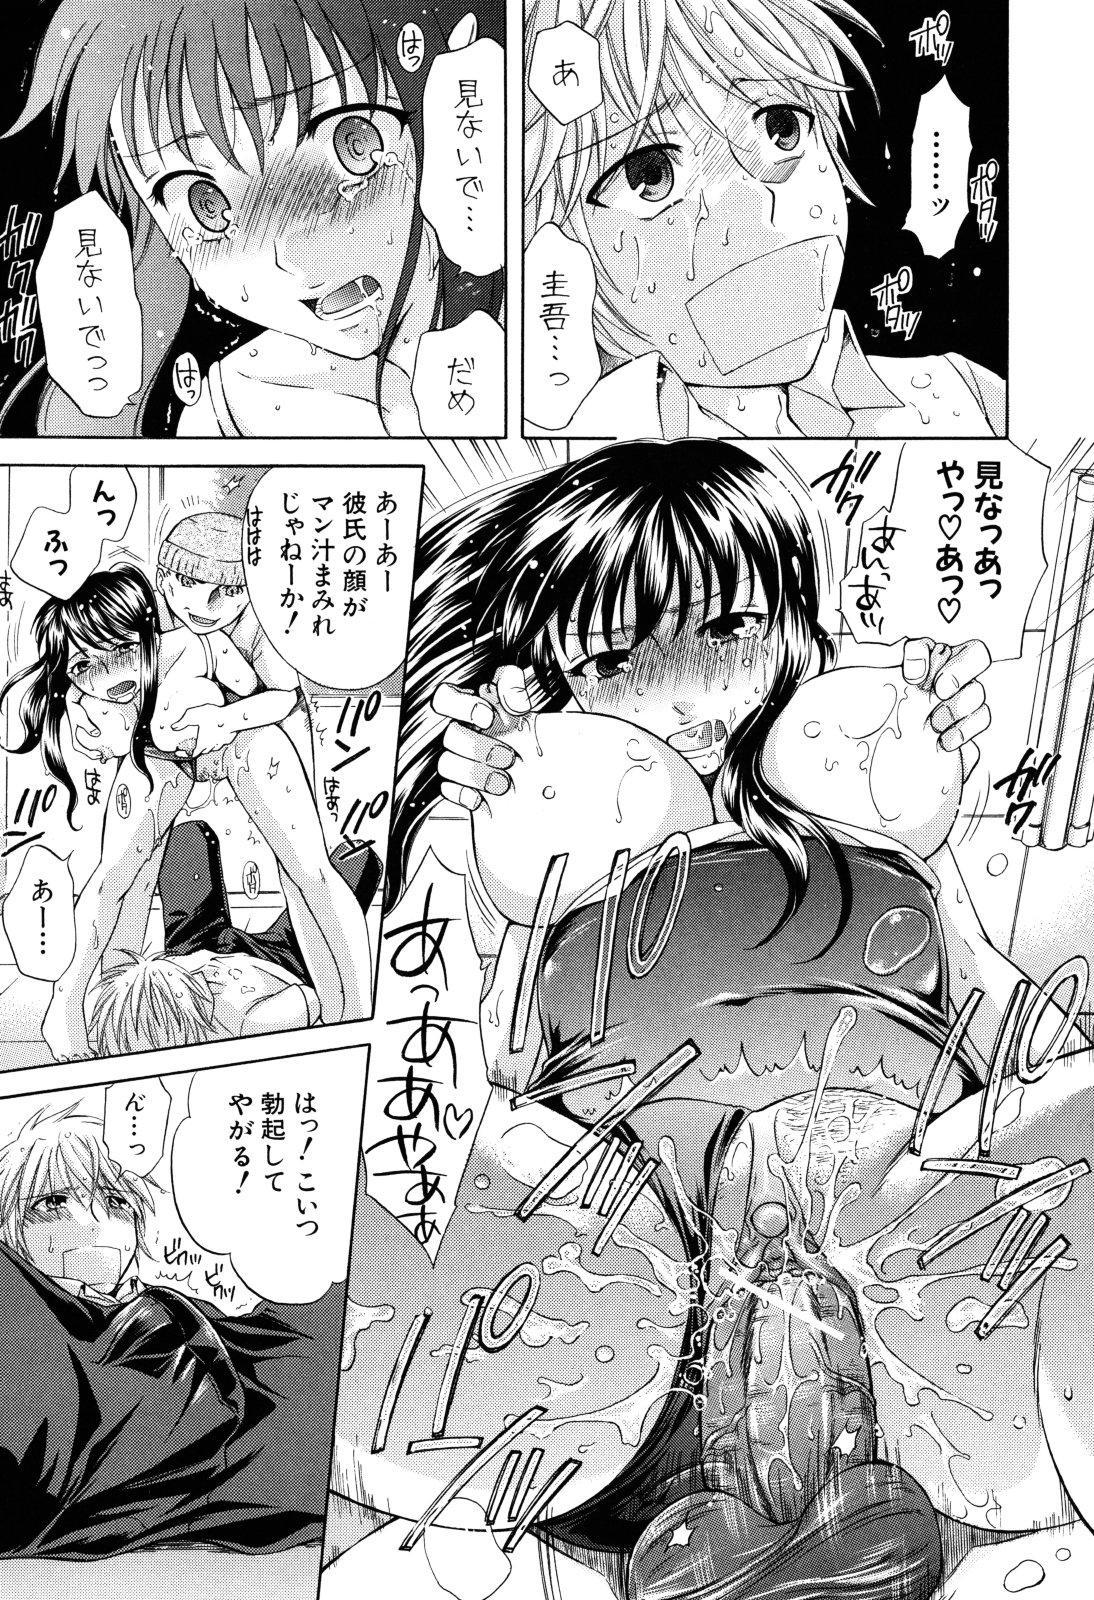 Kanojo ga Ochiru made - She in the depth 210